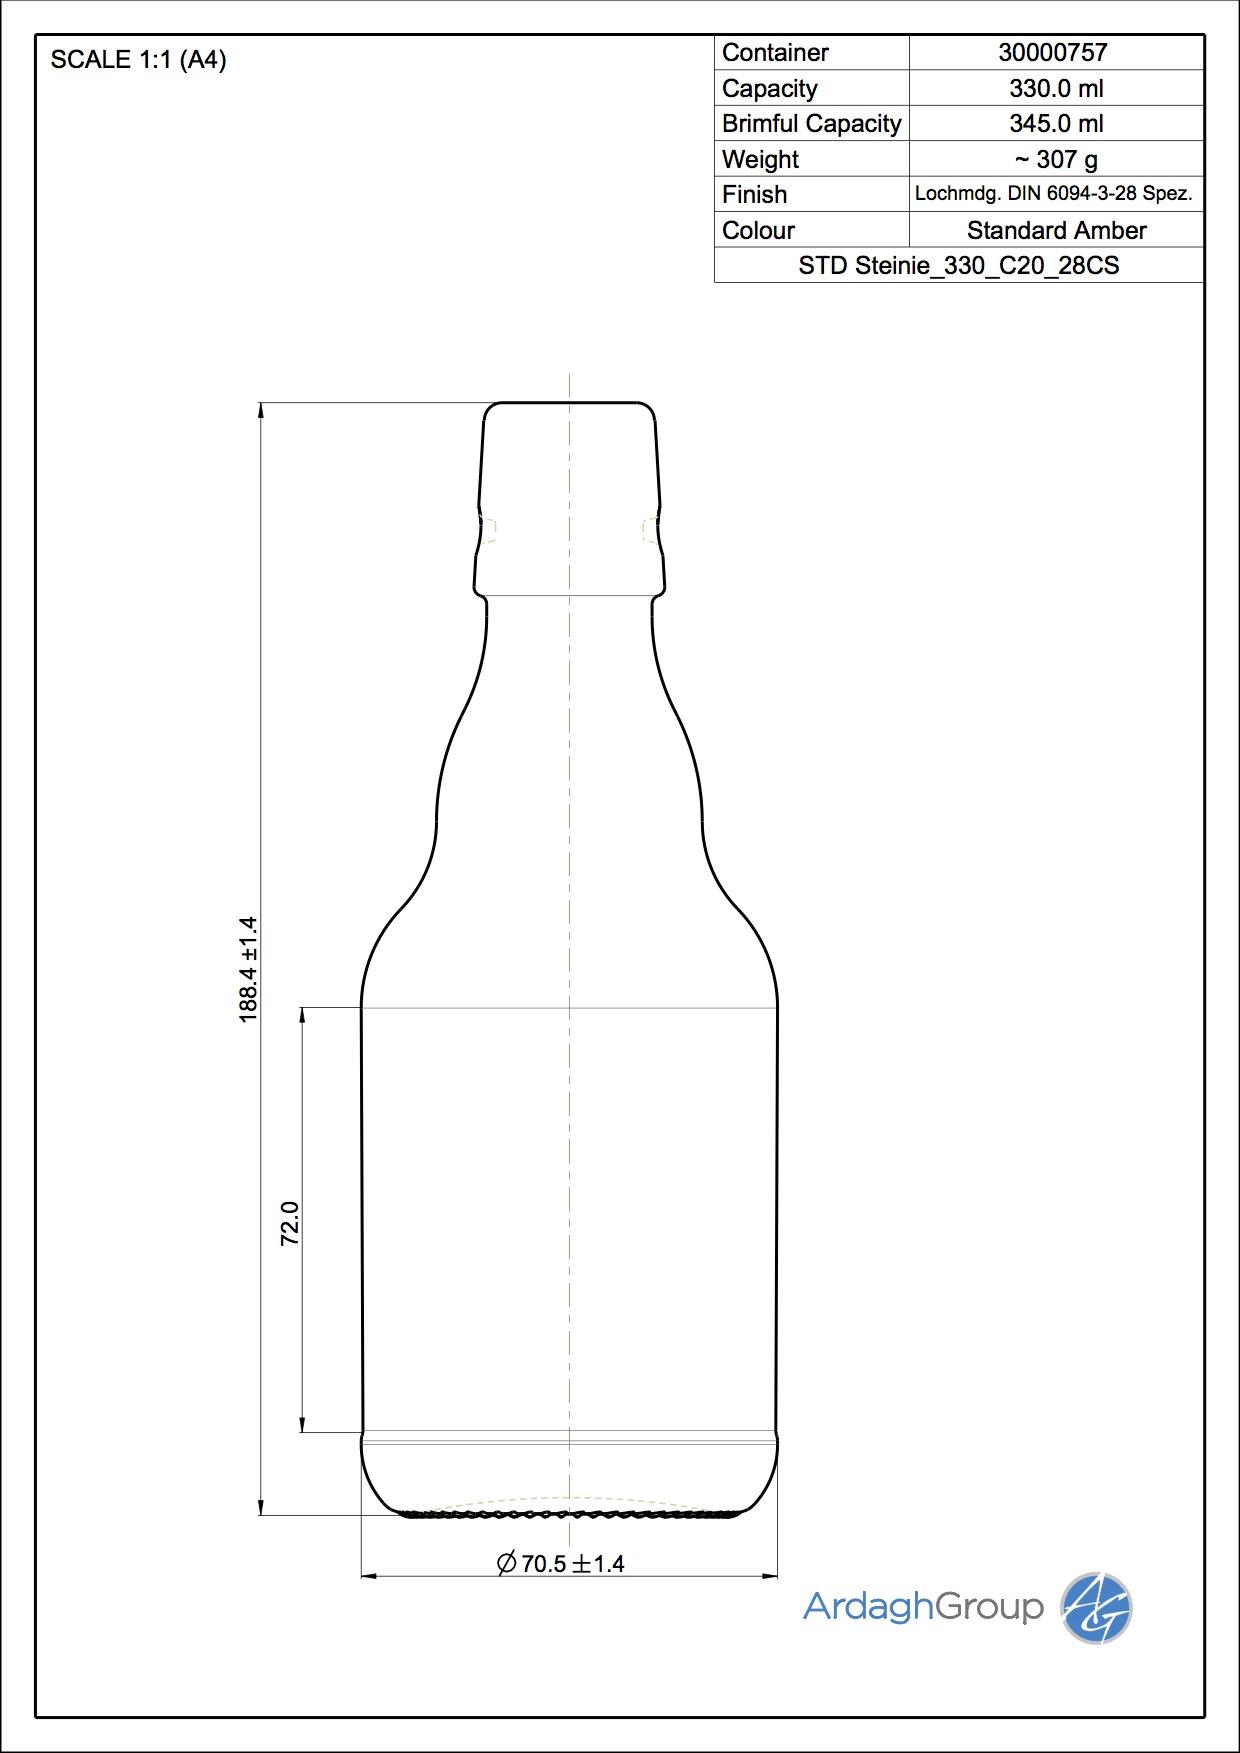 330ml Amber Glass Steinie Swingtop Returnable Beer Bottle 30000757